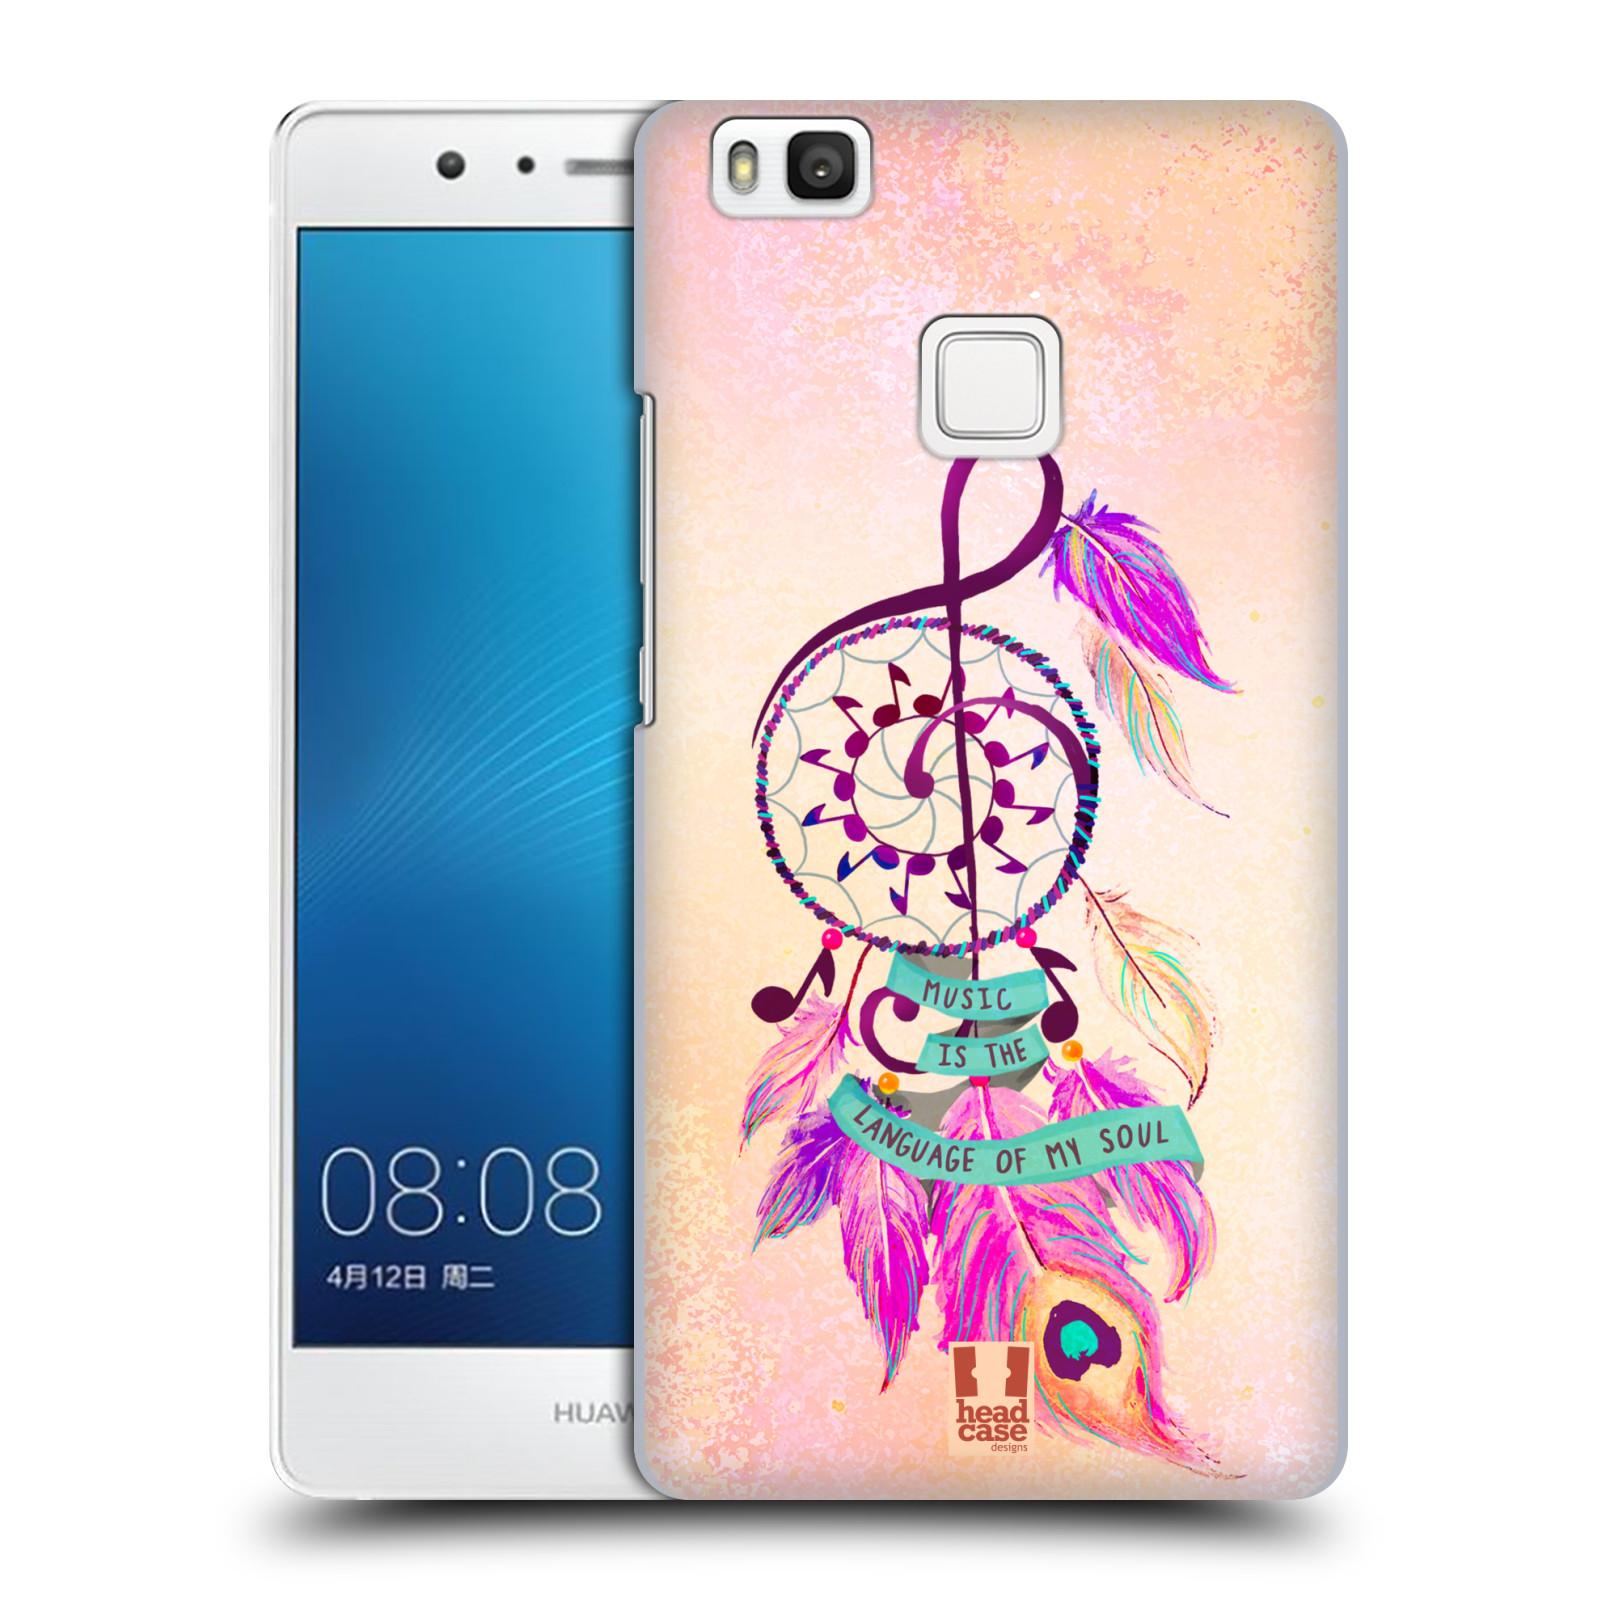 Plastové pouzdro na mobil Huawei P9 Lite HEAD CASE Lapač Assorted Music